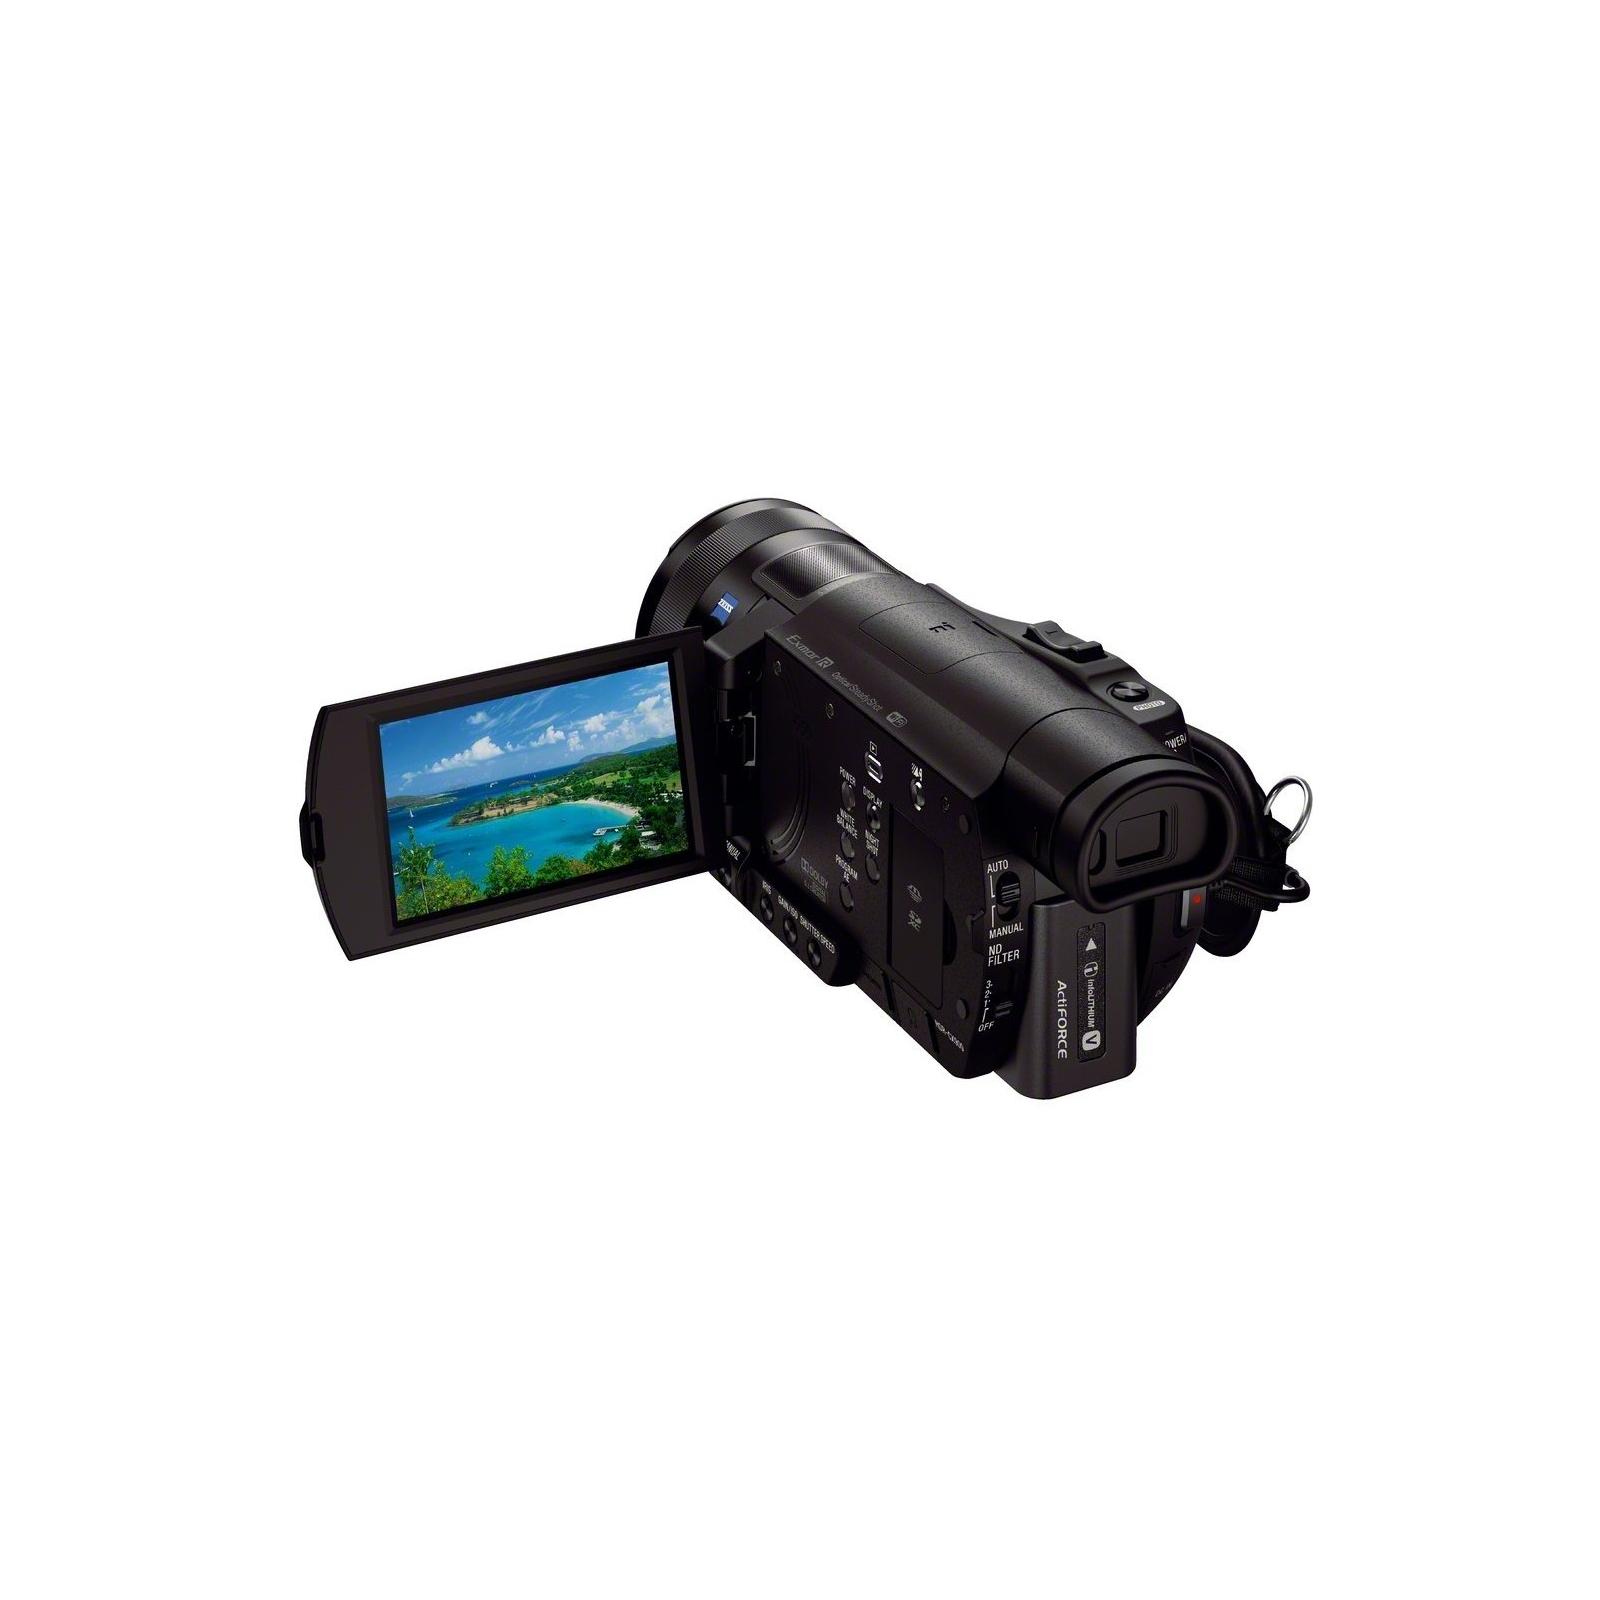 Цифровая видеокамера SONY Handycam HDR-CX900 Black (HDRCX900EB.CEN) изображение 5